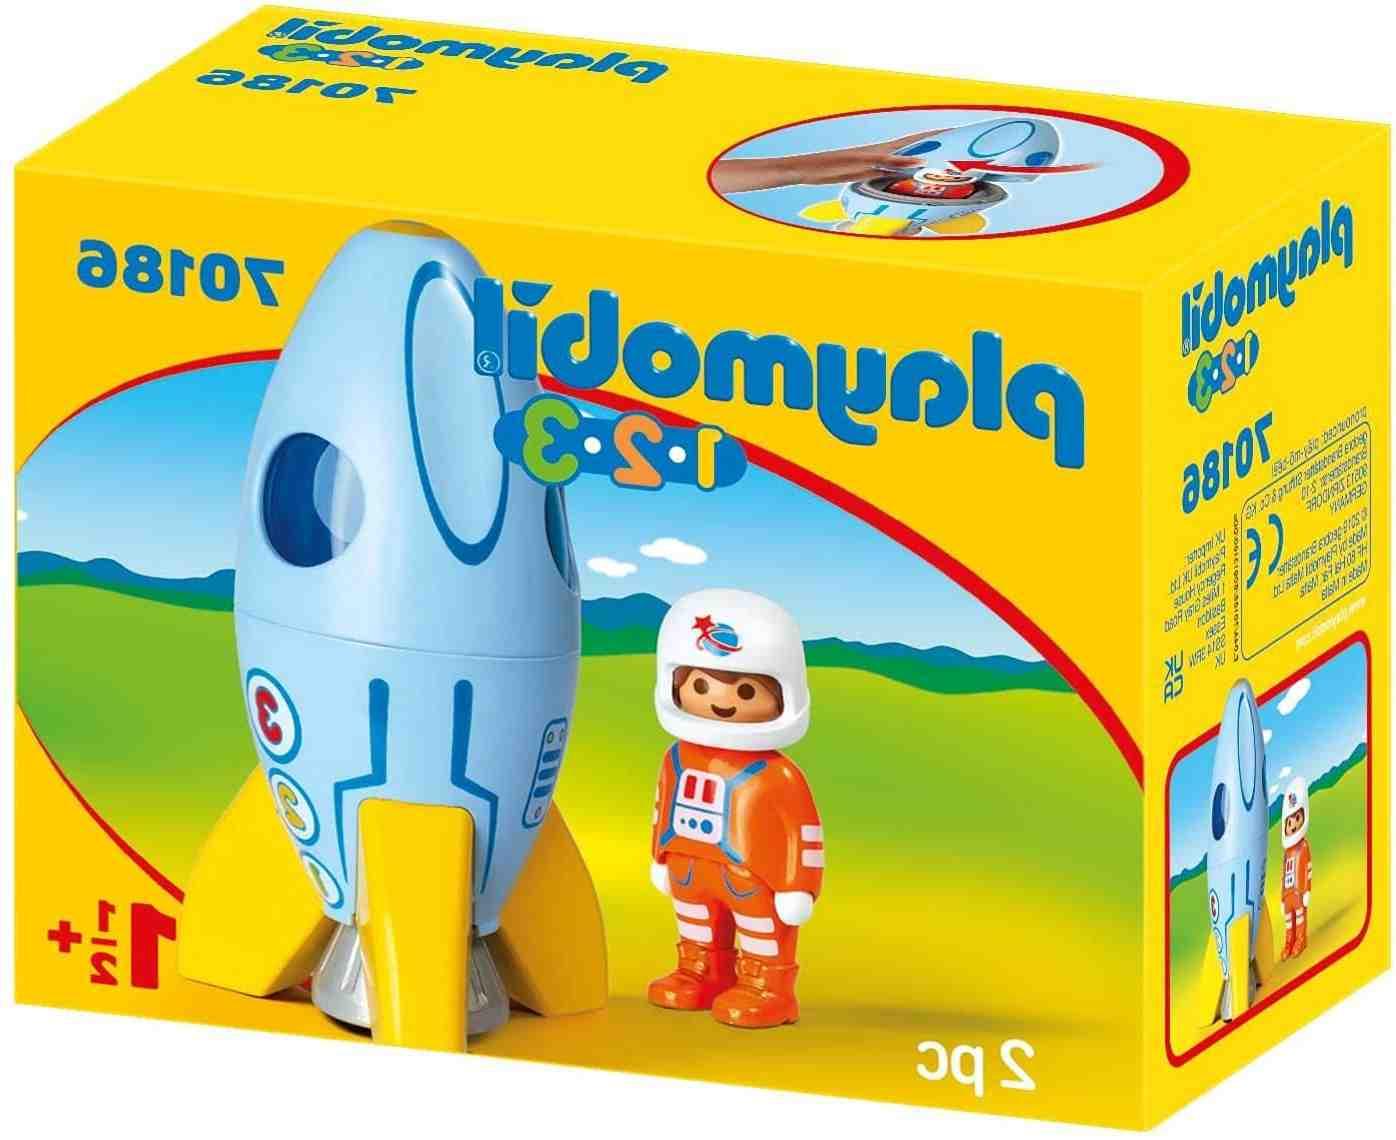 Quel Playmobil acheter ?